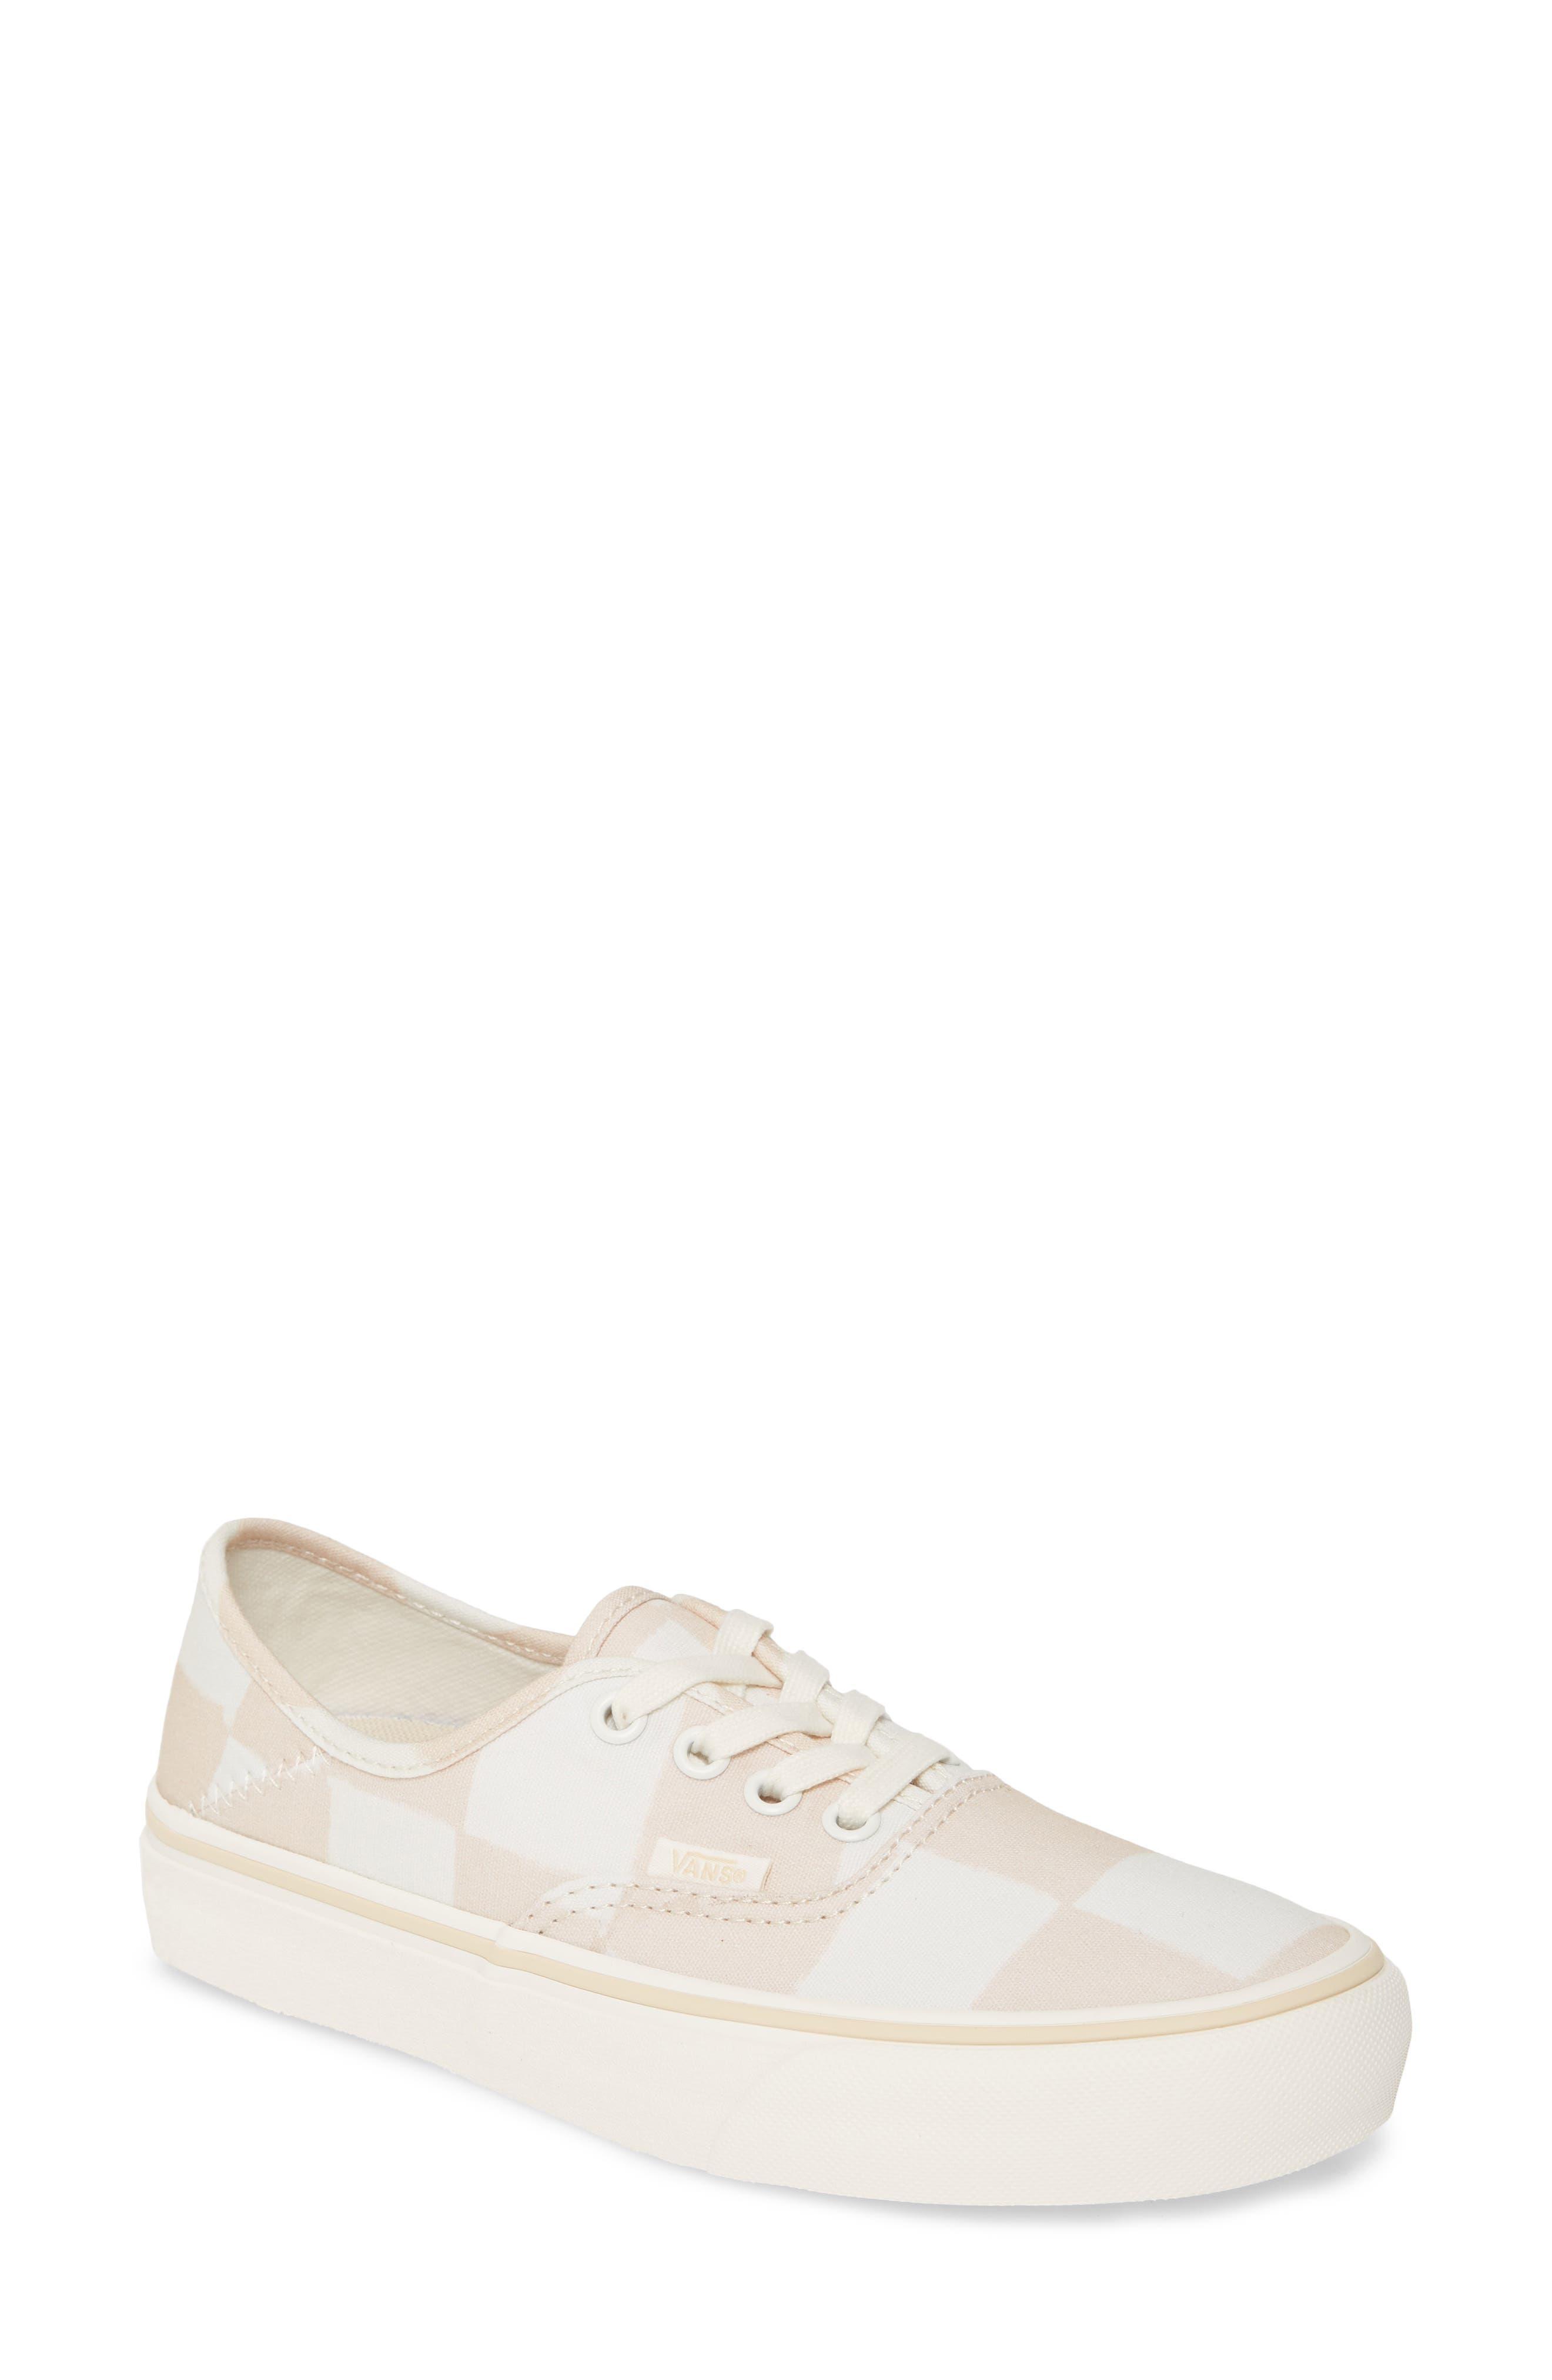 Vans Authentic Print Low Top Sneaker, Ivory